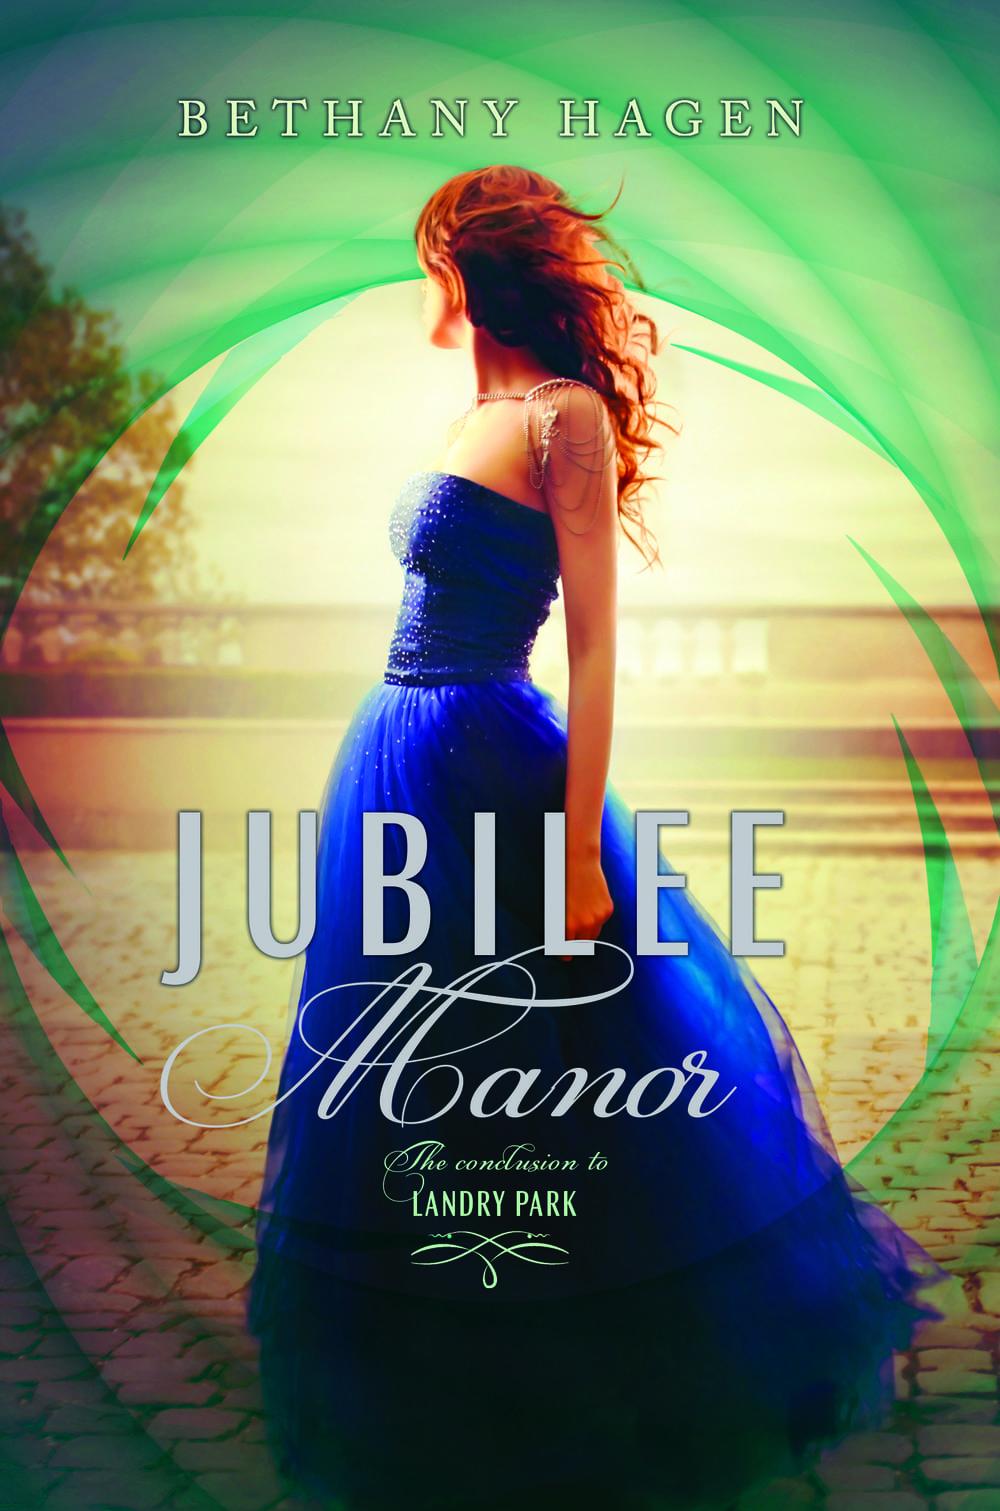 JubileeManor.jpg